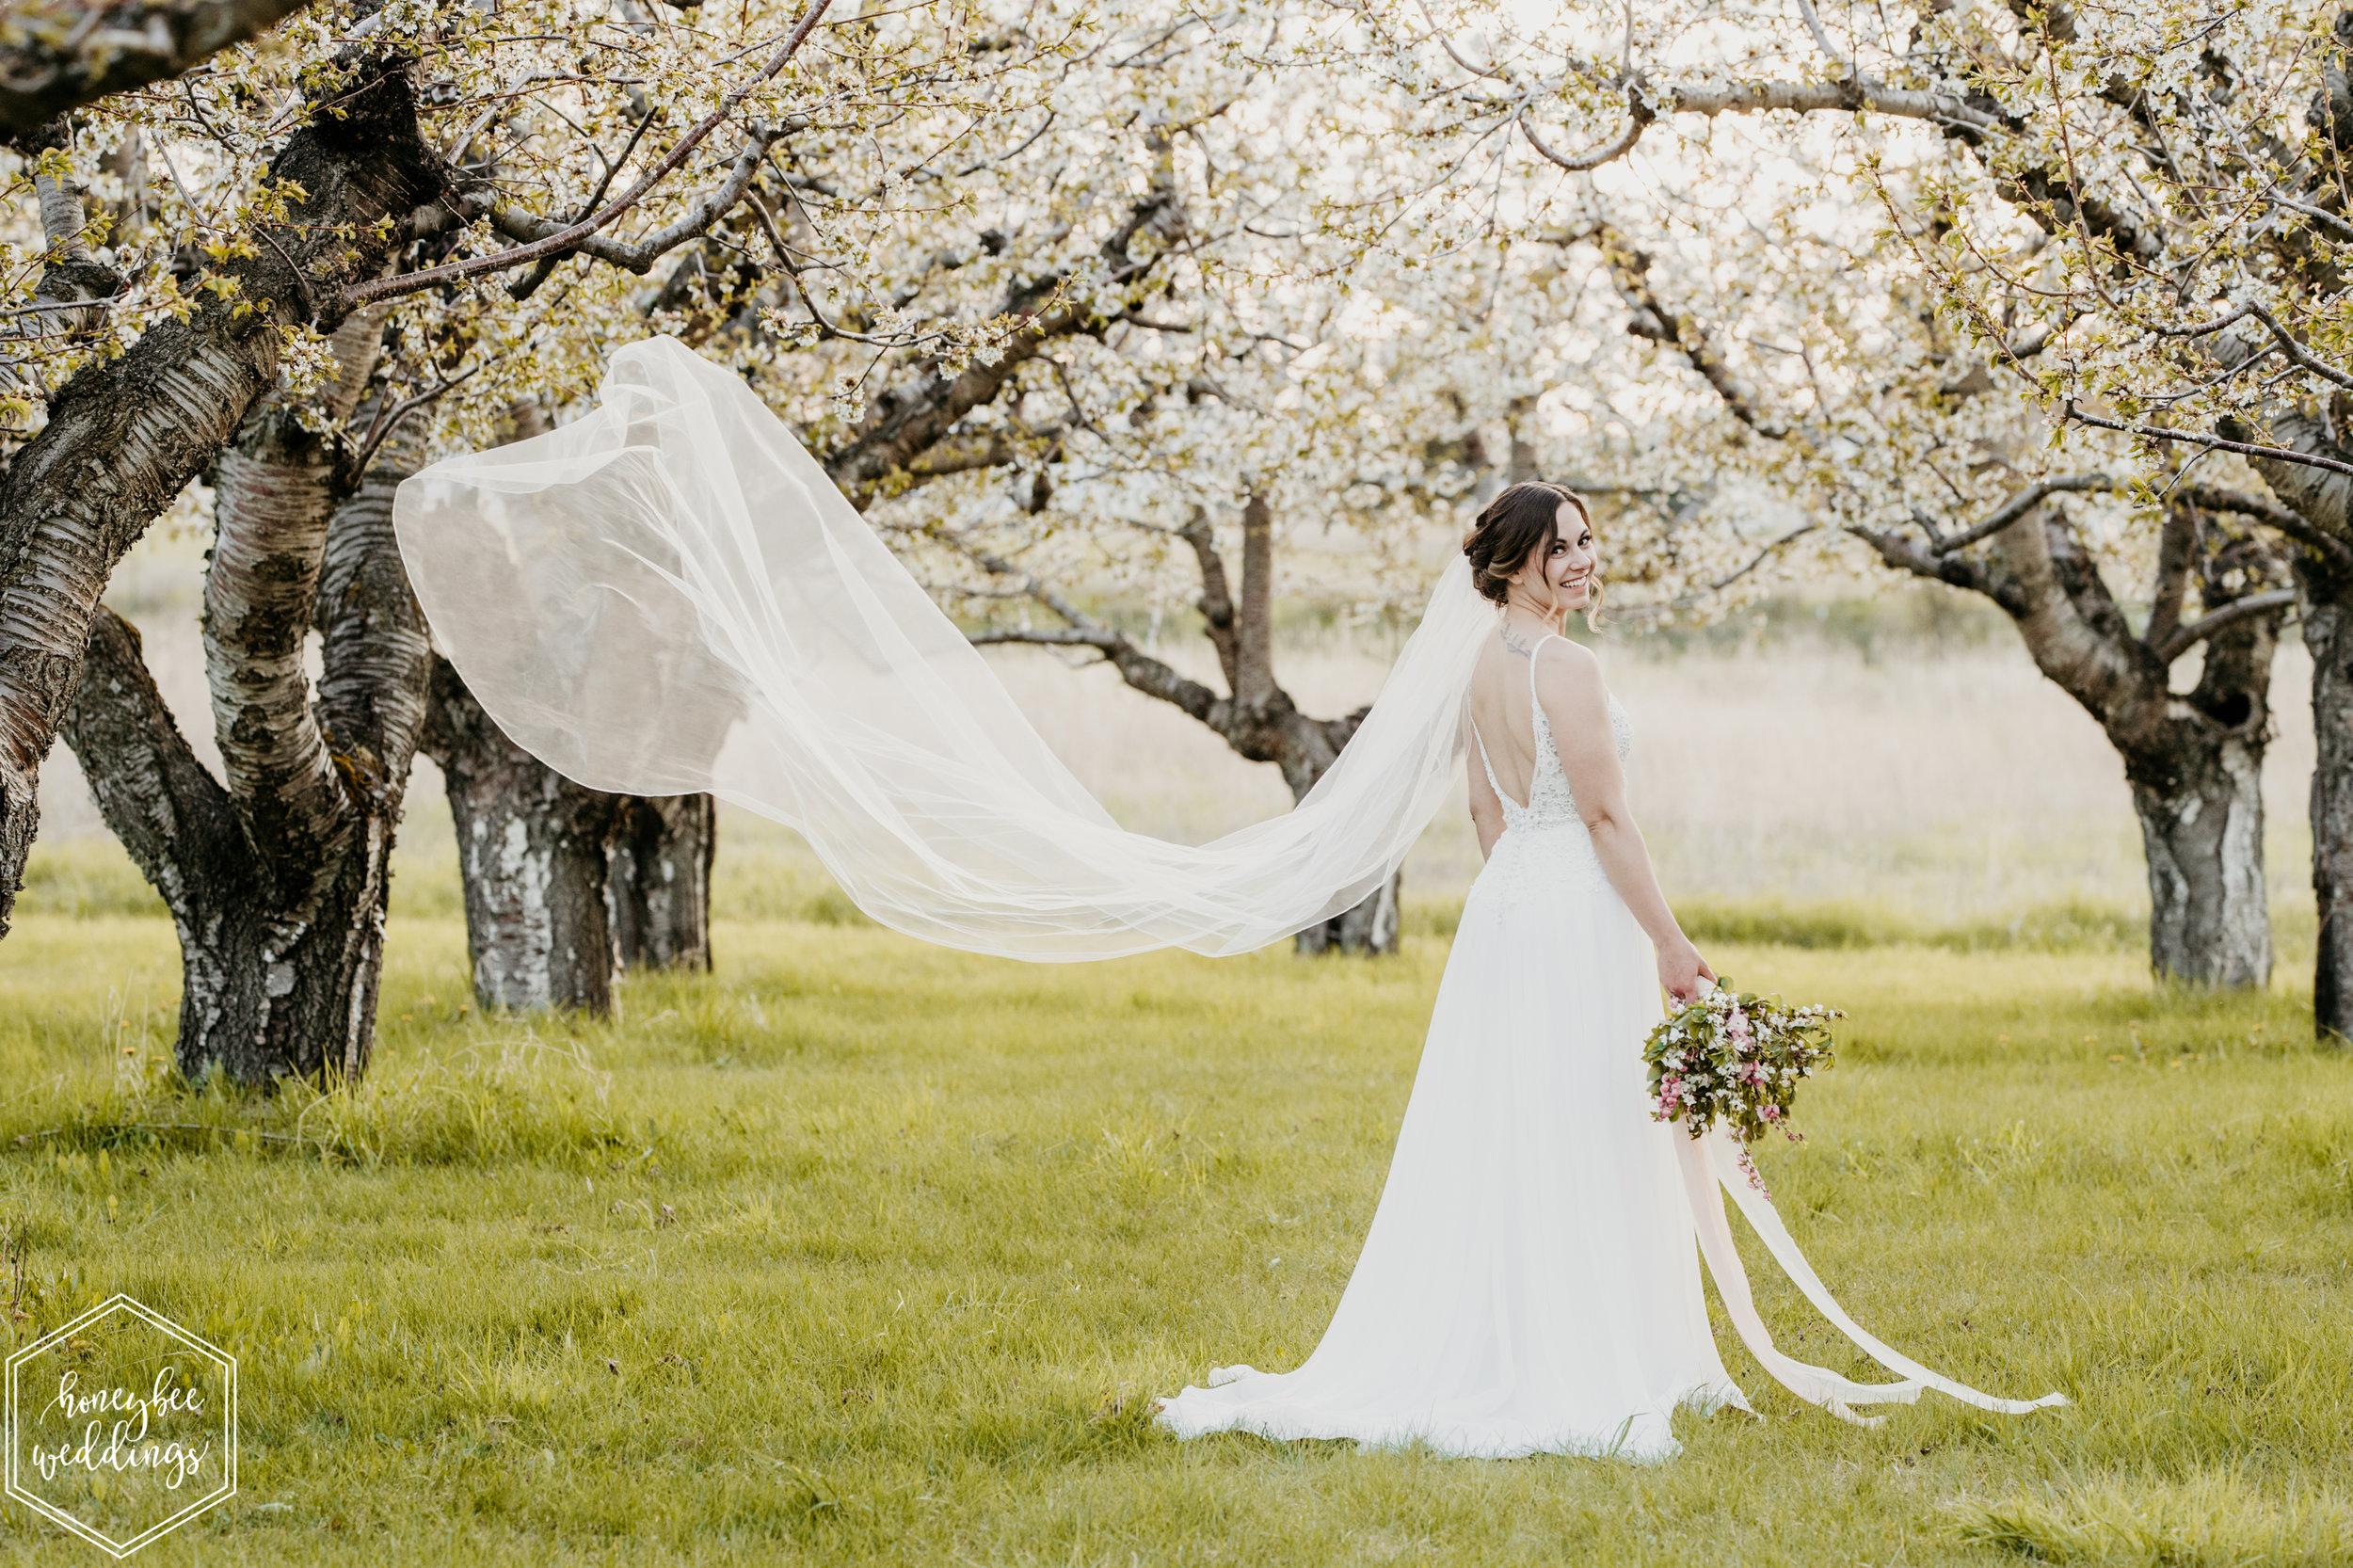 172Cherry Blossom Wedding_Styled Photoshoot_Honeybee Weddings_May 11, 2019-676.jpg